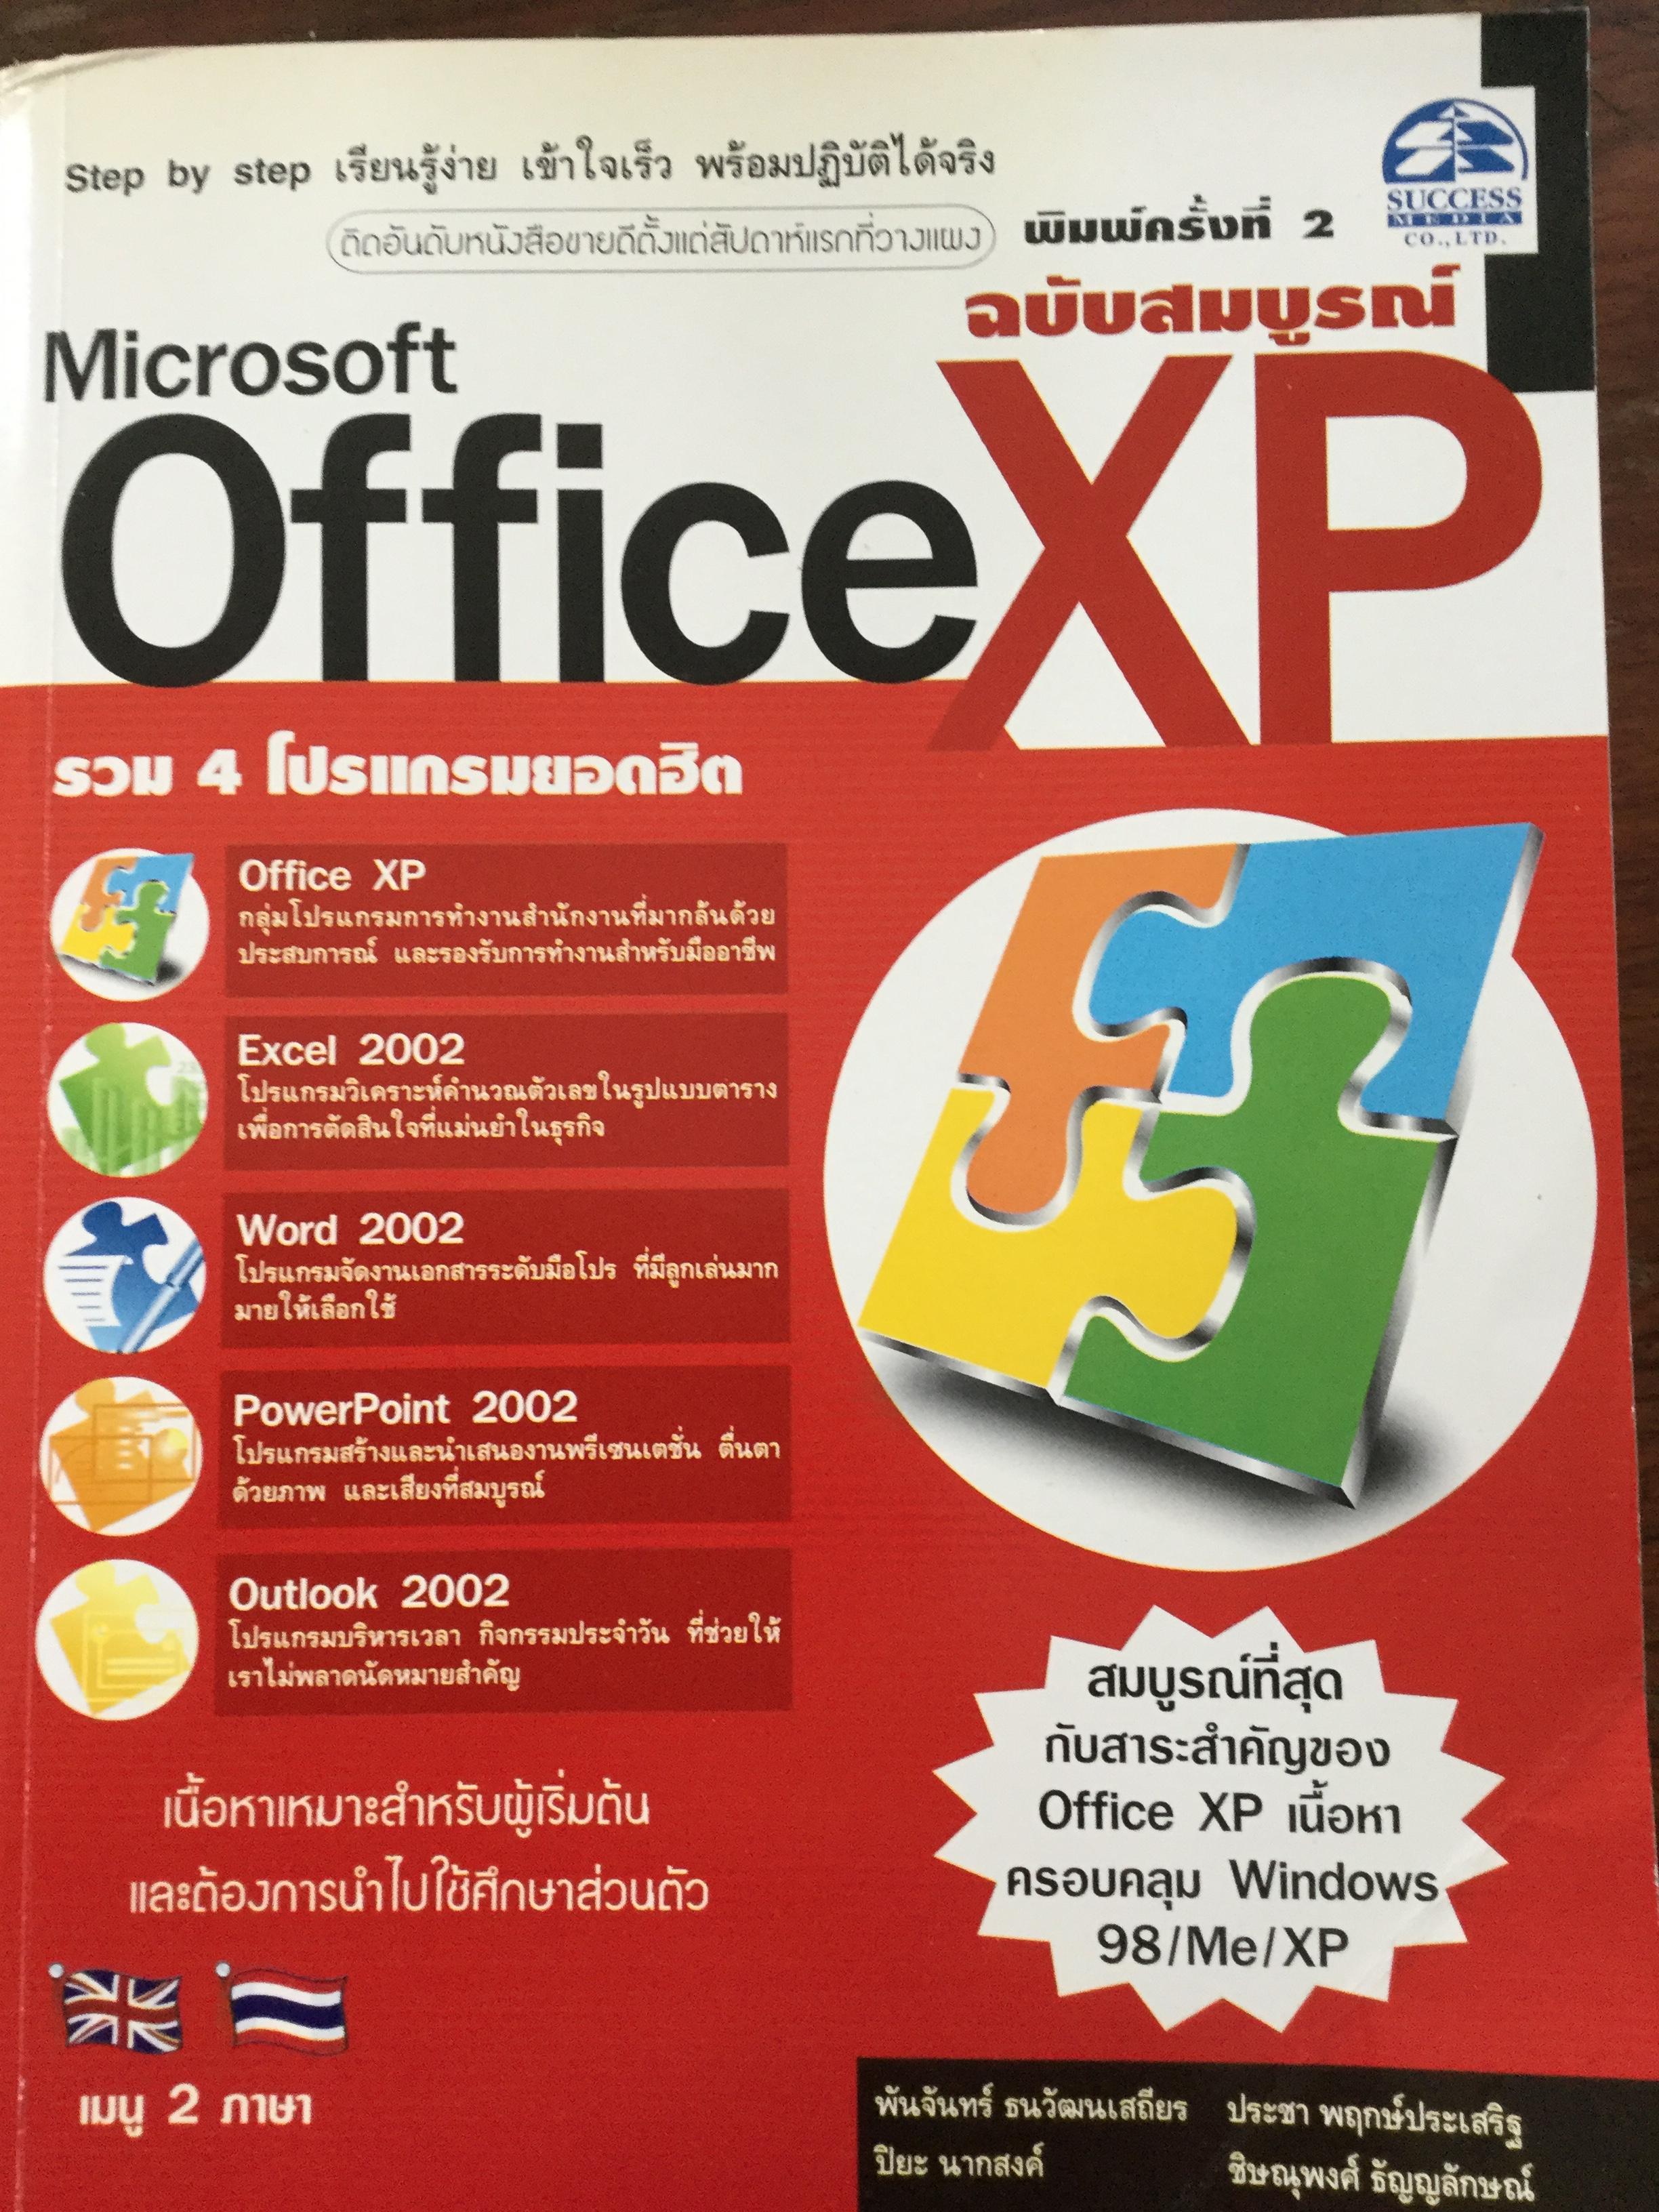 Microsoft Office XPฉบับสมบูรณ์ รวม 4โปรแกรมยอดฮิต